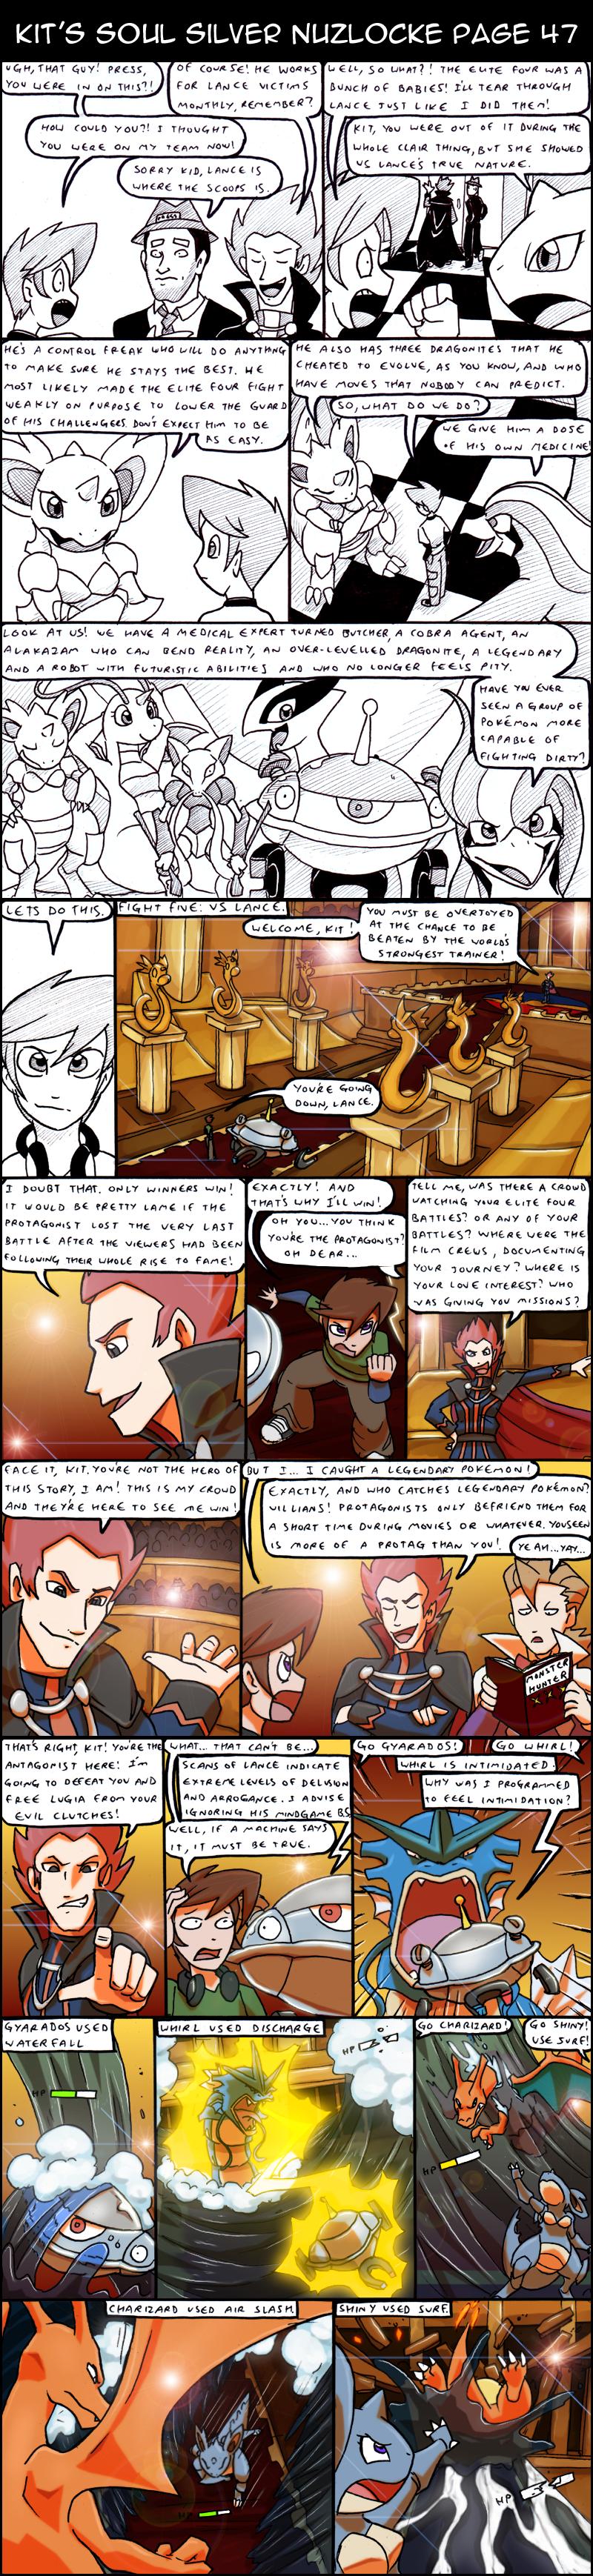 Kit's Soul Silver Nuzlocke page 47 by kitfox-crimson